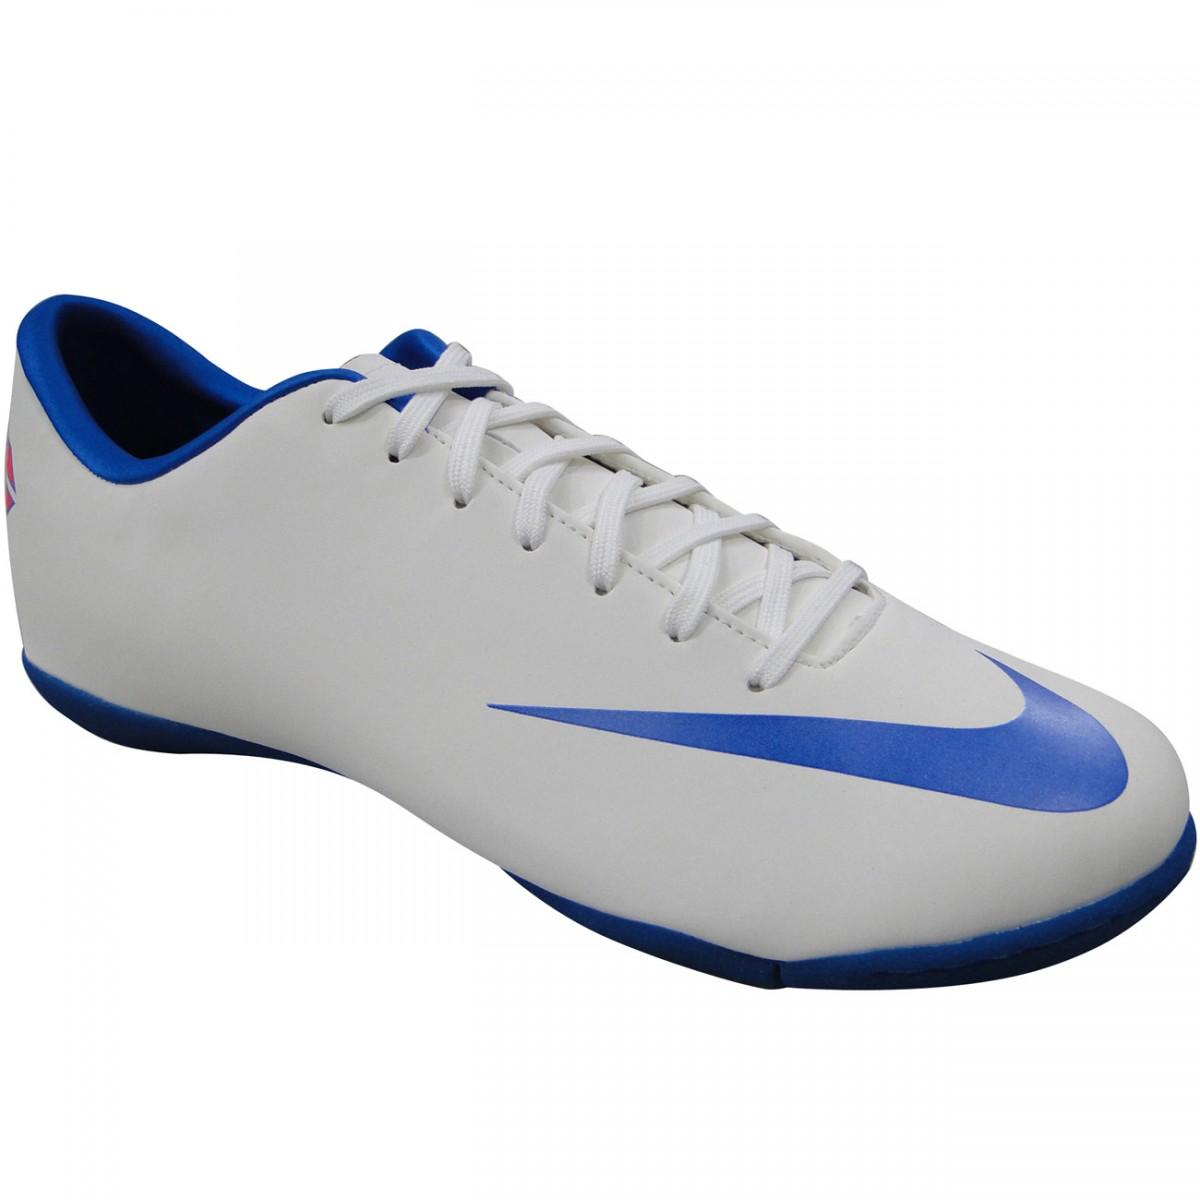 TENIS Nike MERCURIAL VICTORY III III III 2931 brancoO/AZUL Chuteira Nike 1a5000